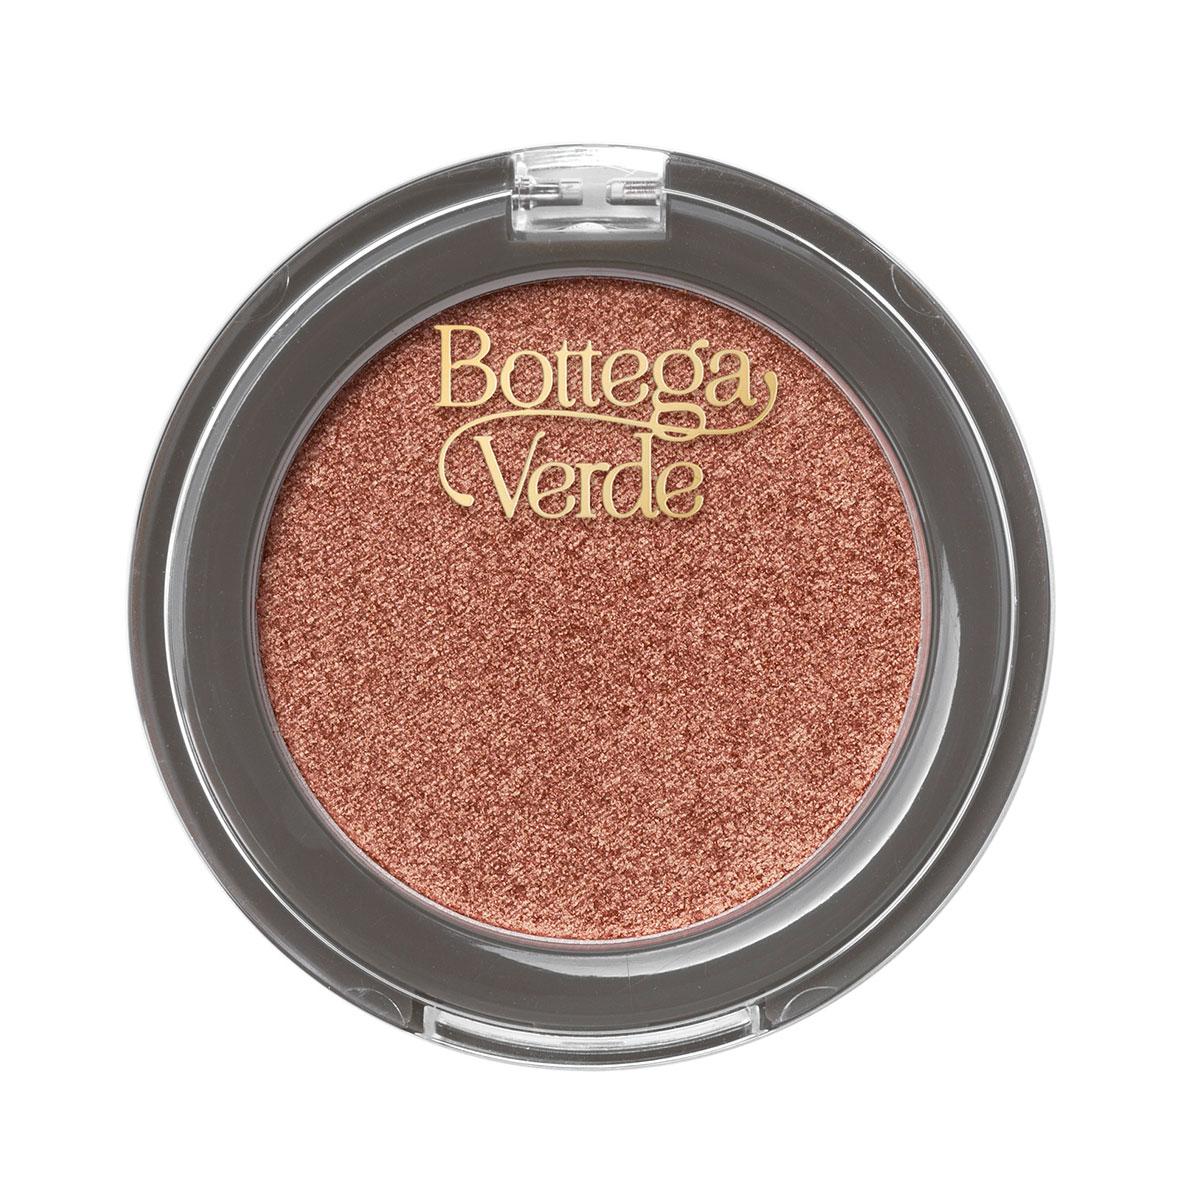 Fard de ochi cu extract de rodie, bronz metalic, 2.5 G